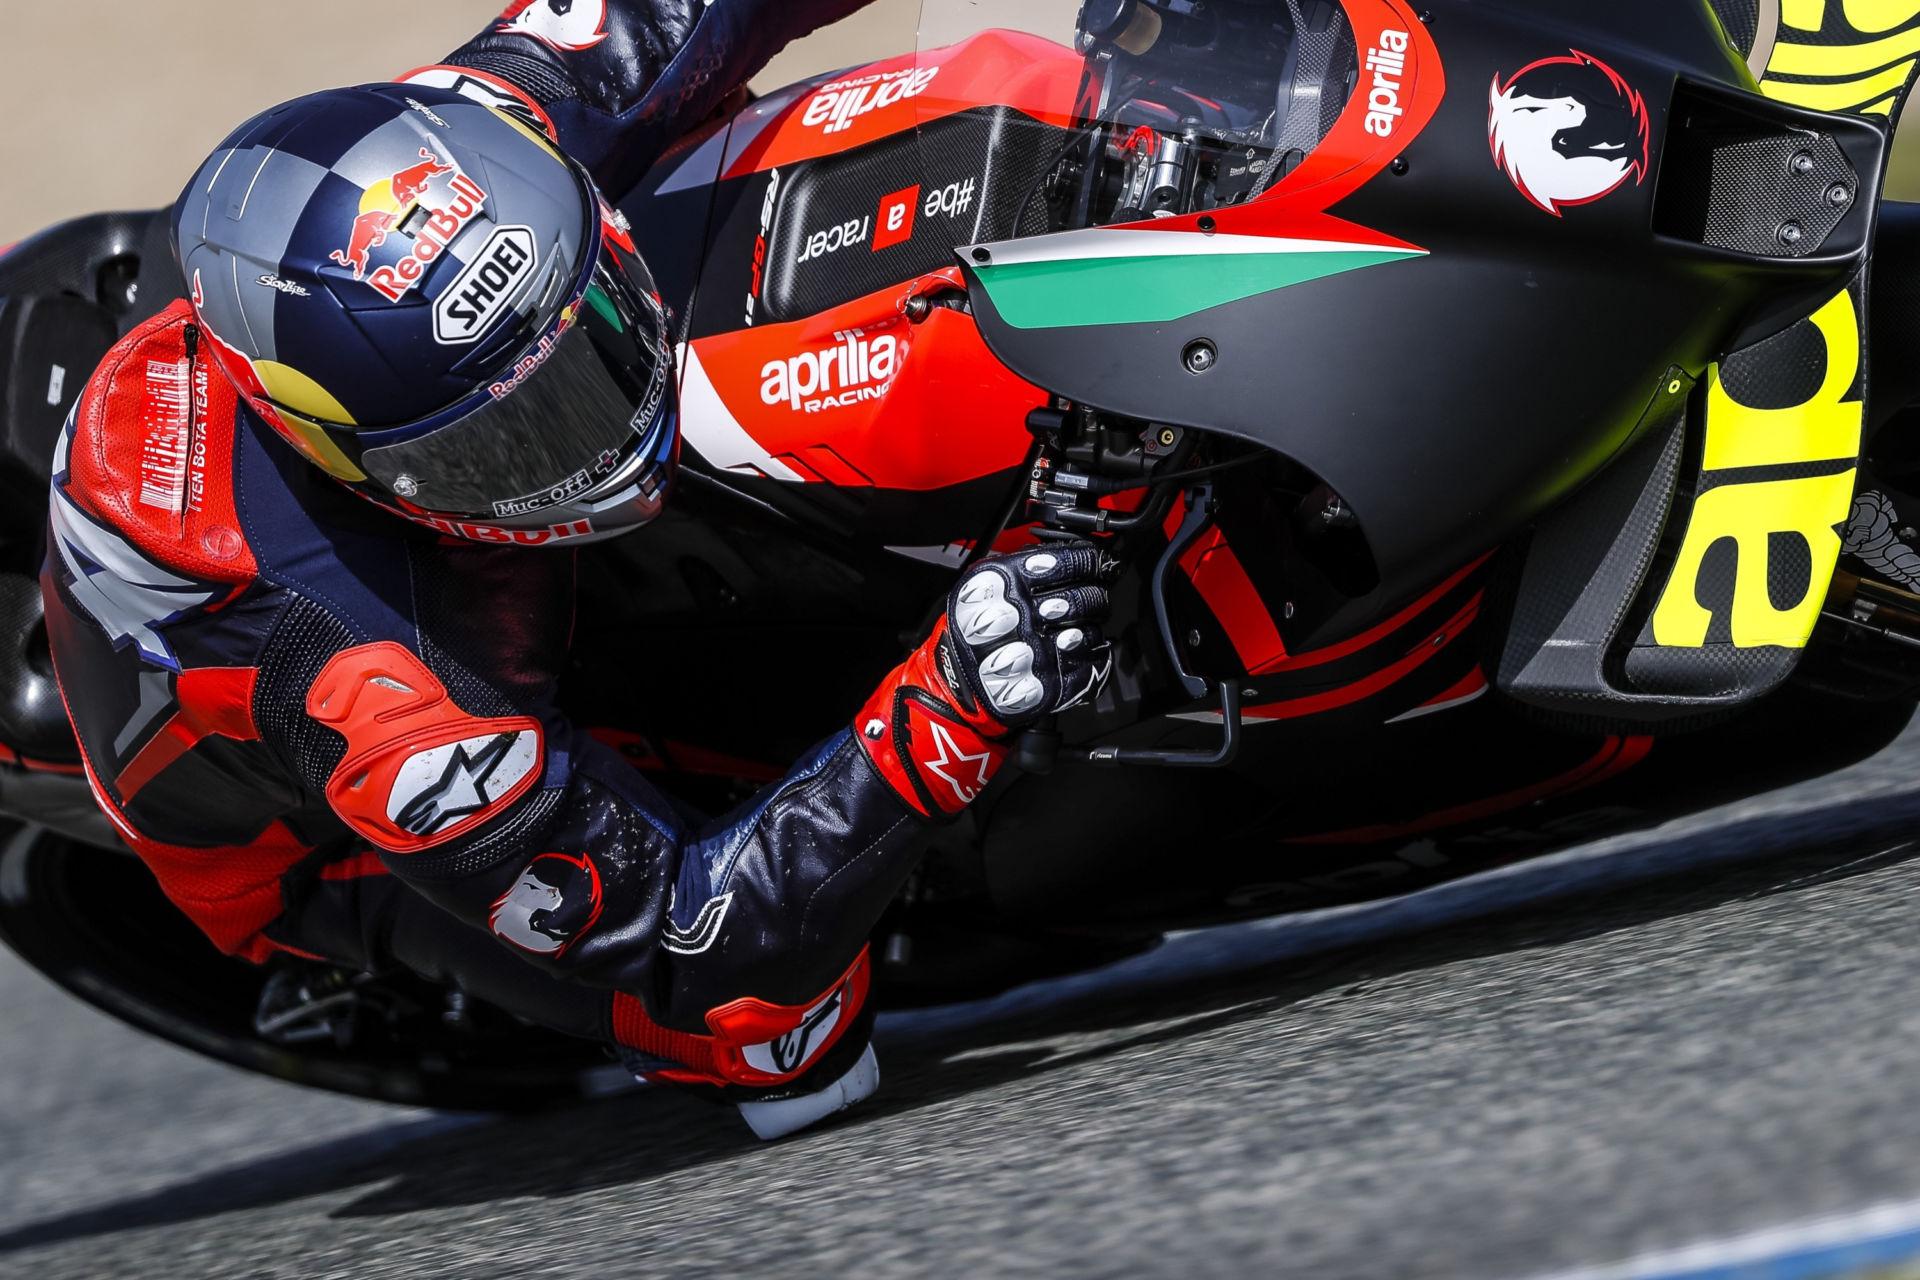 Andrea Dovizioso on an Aprilia RS-GP at Jerez. Photo courtesy Aprilia.